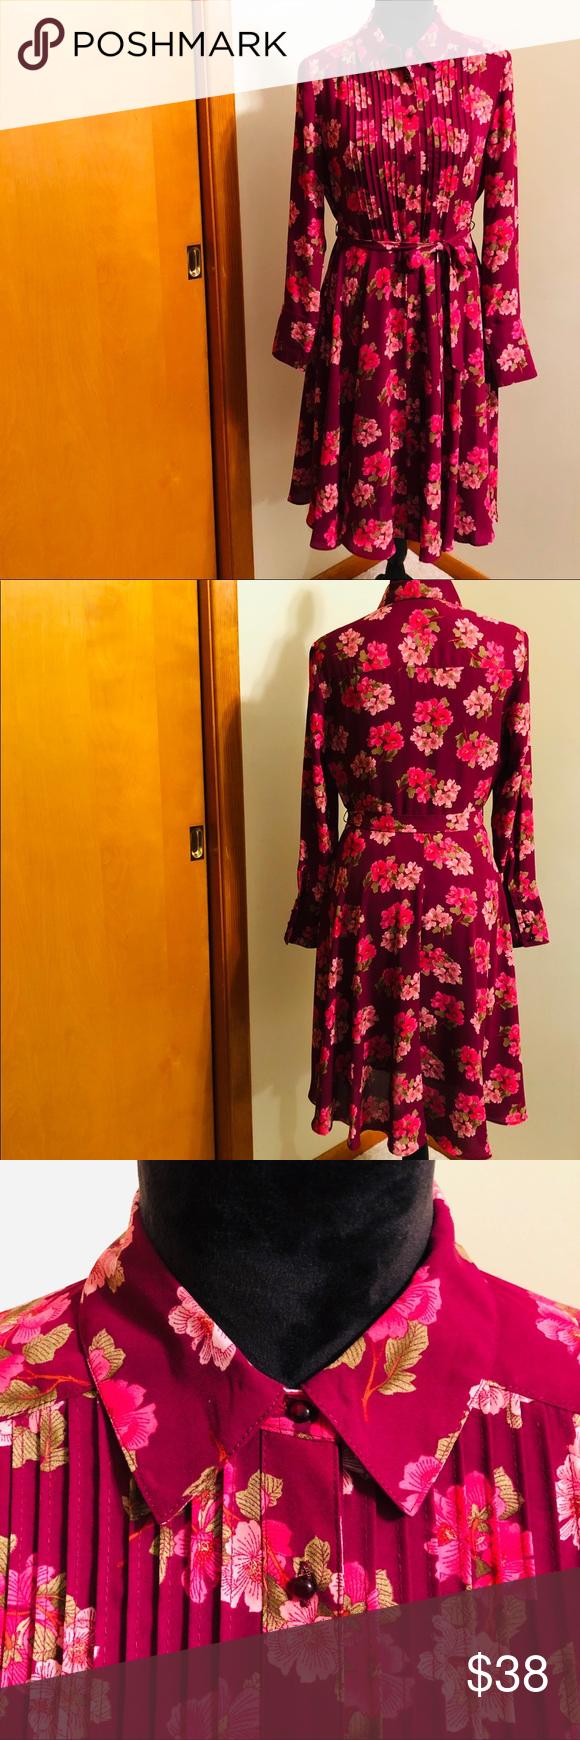 Nanette Lepore Pink Cherry Blossom Dress Cherry Blossom Dress Cherry Blossom Shirt Nanette Lepore Dress